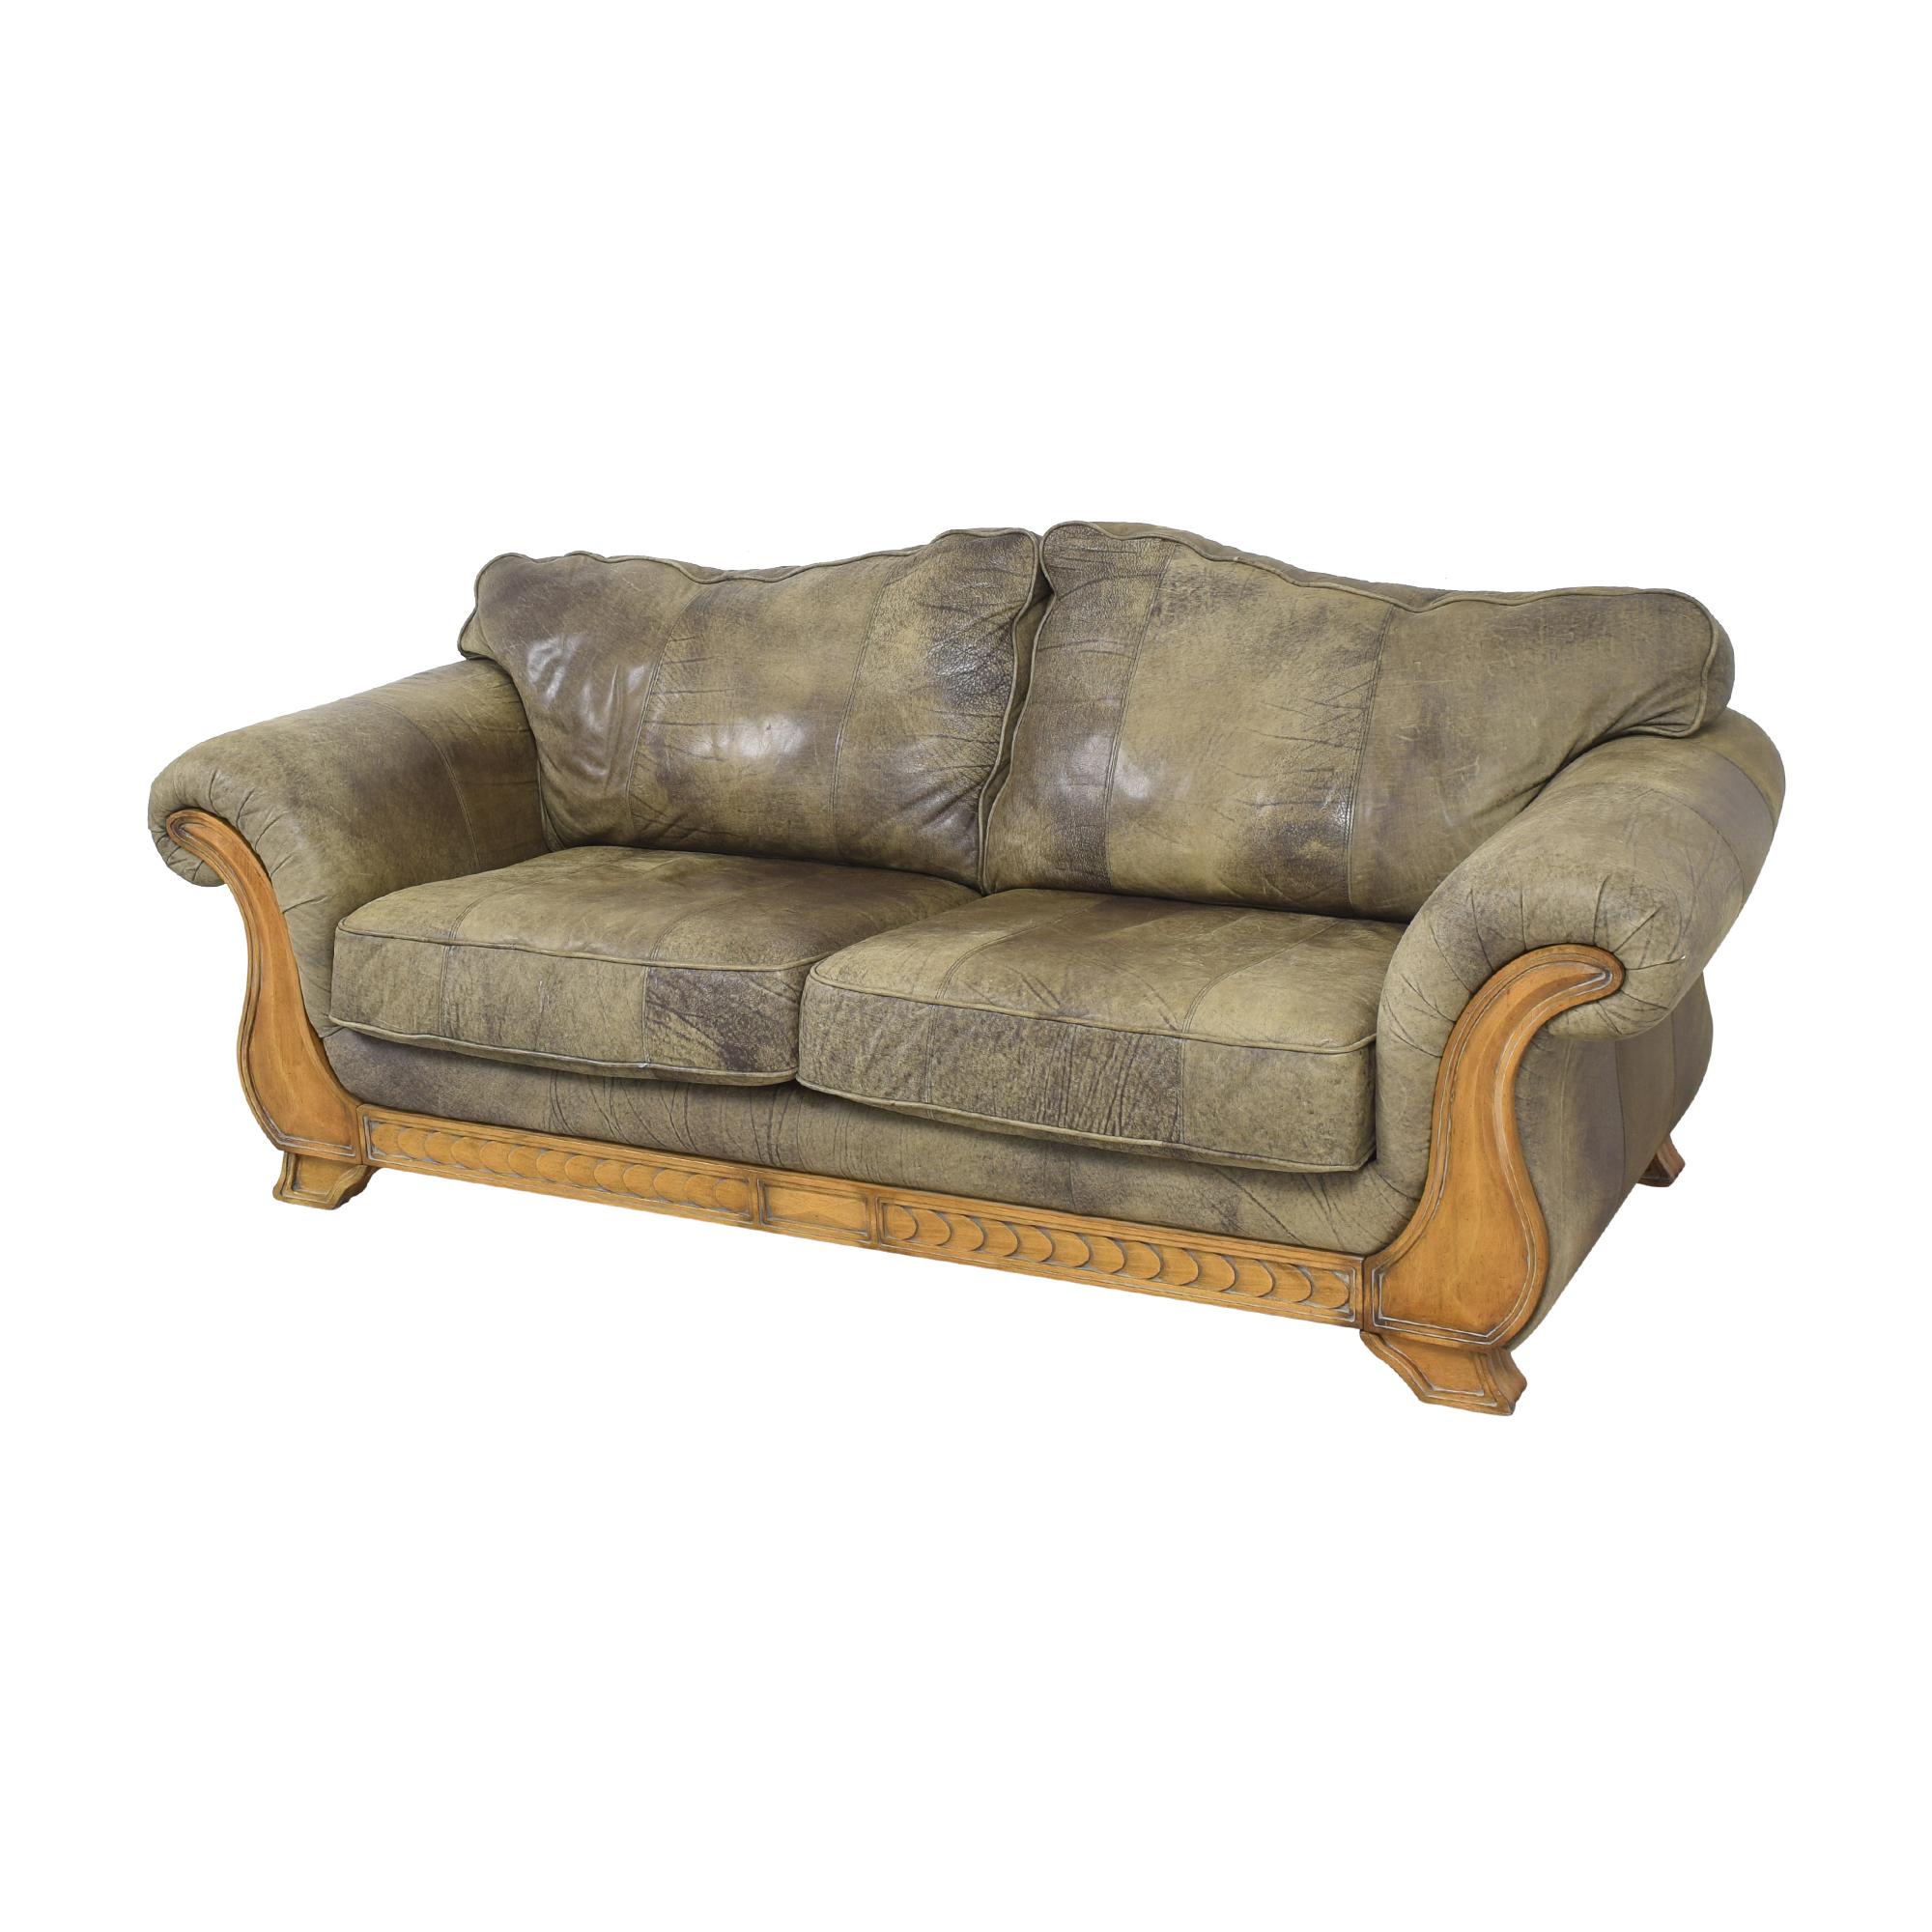 Flexsteel Flexsteel Sahara Retreat Two Cushion Sofa second hand